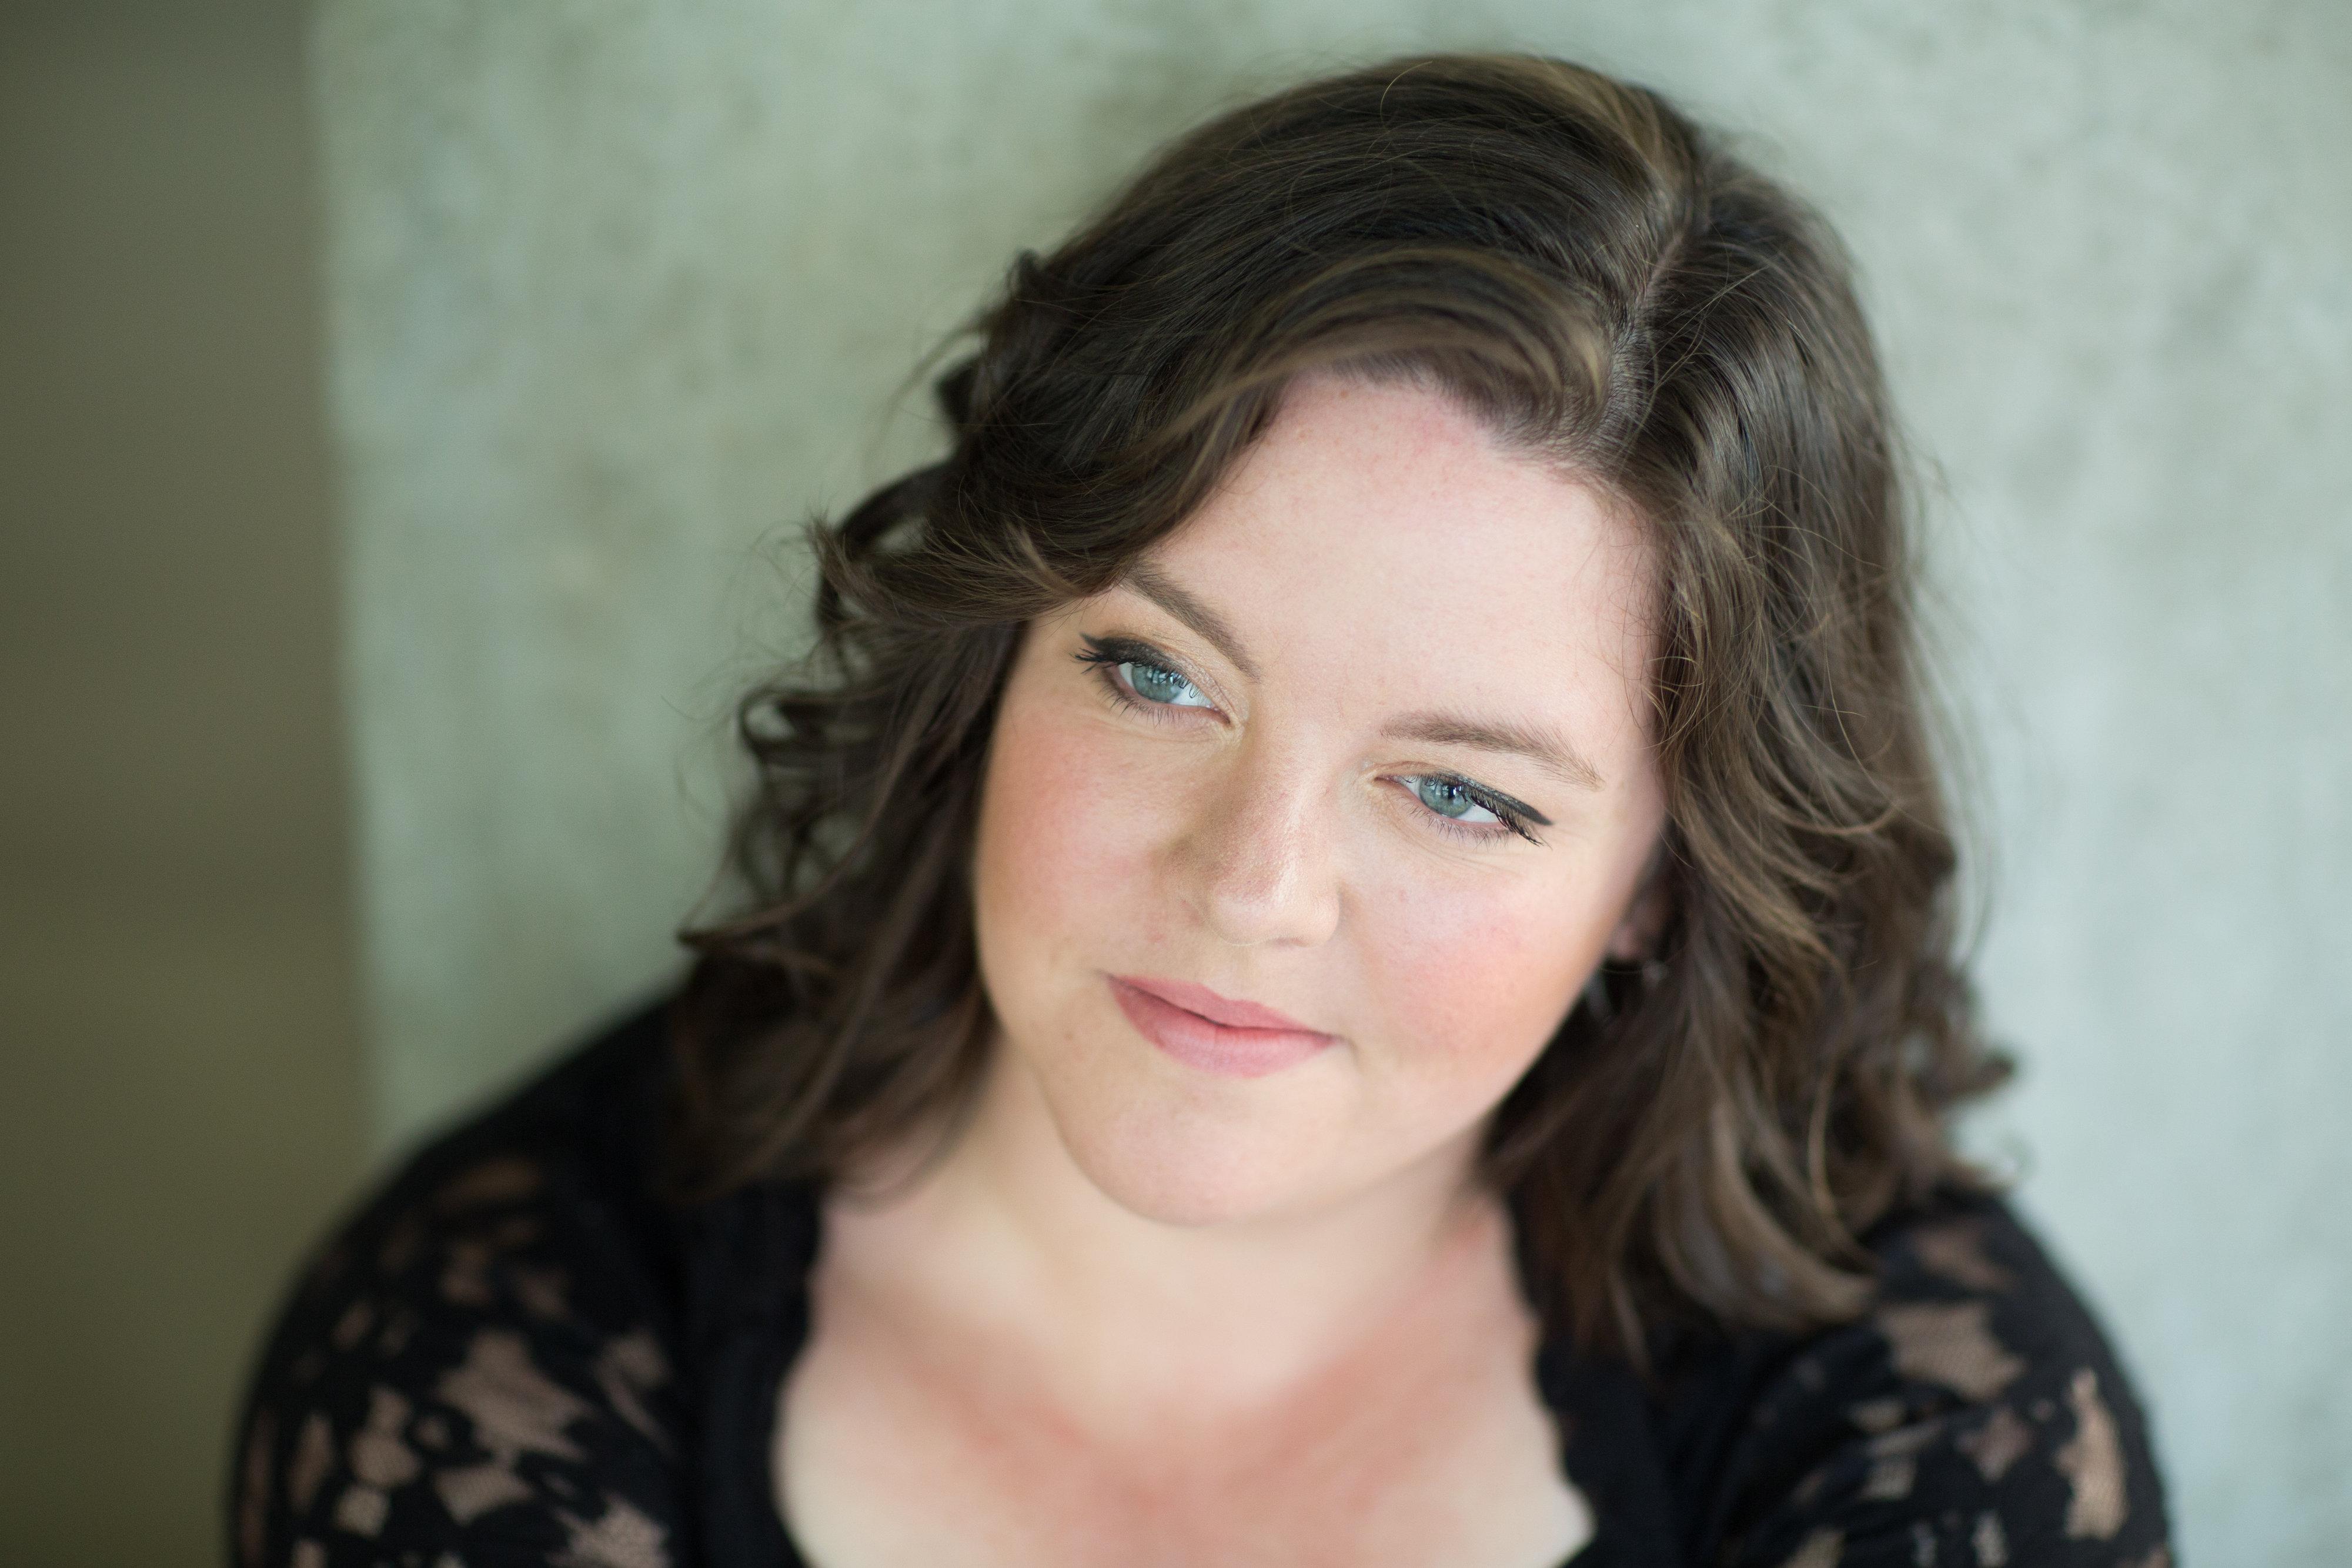 Elyse Charlebois, casting